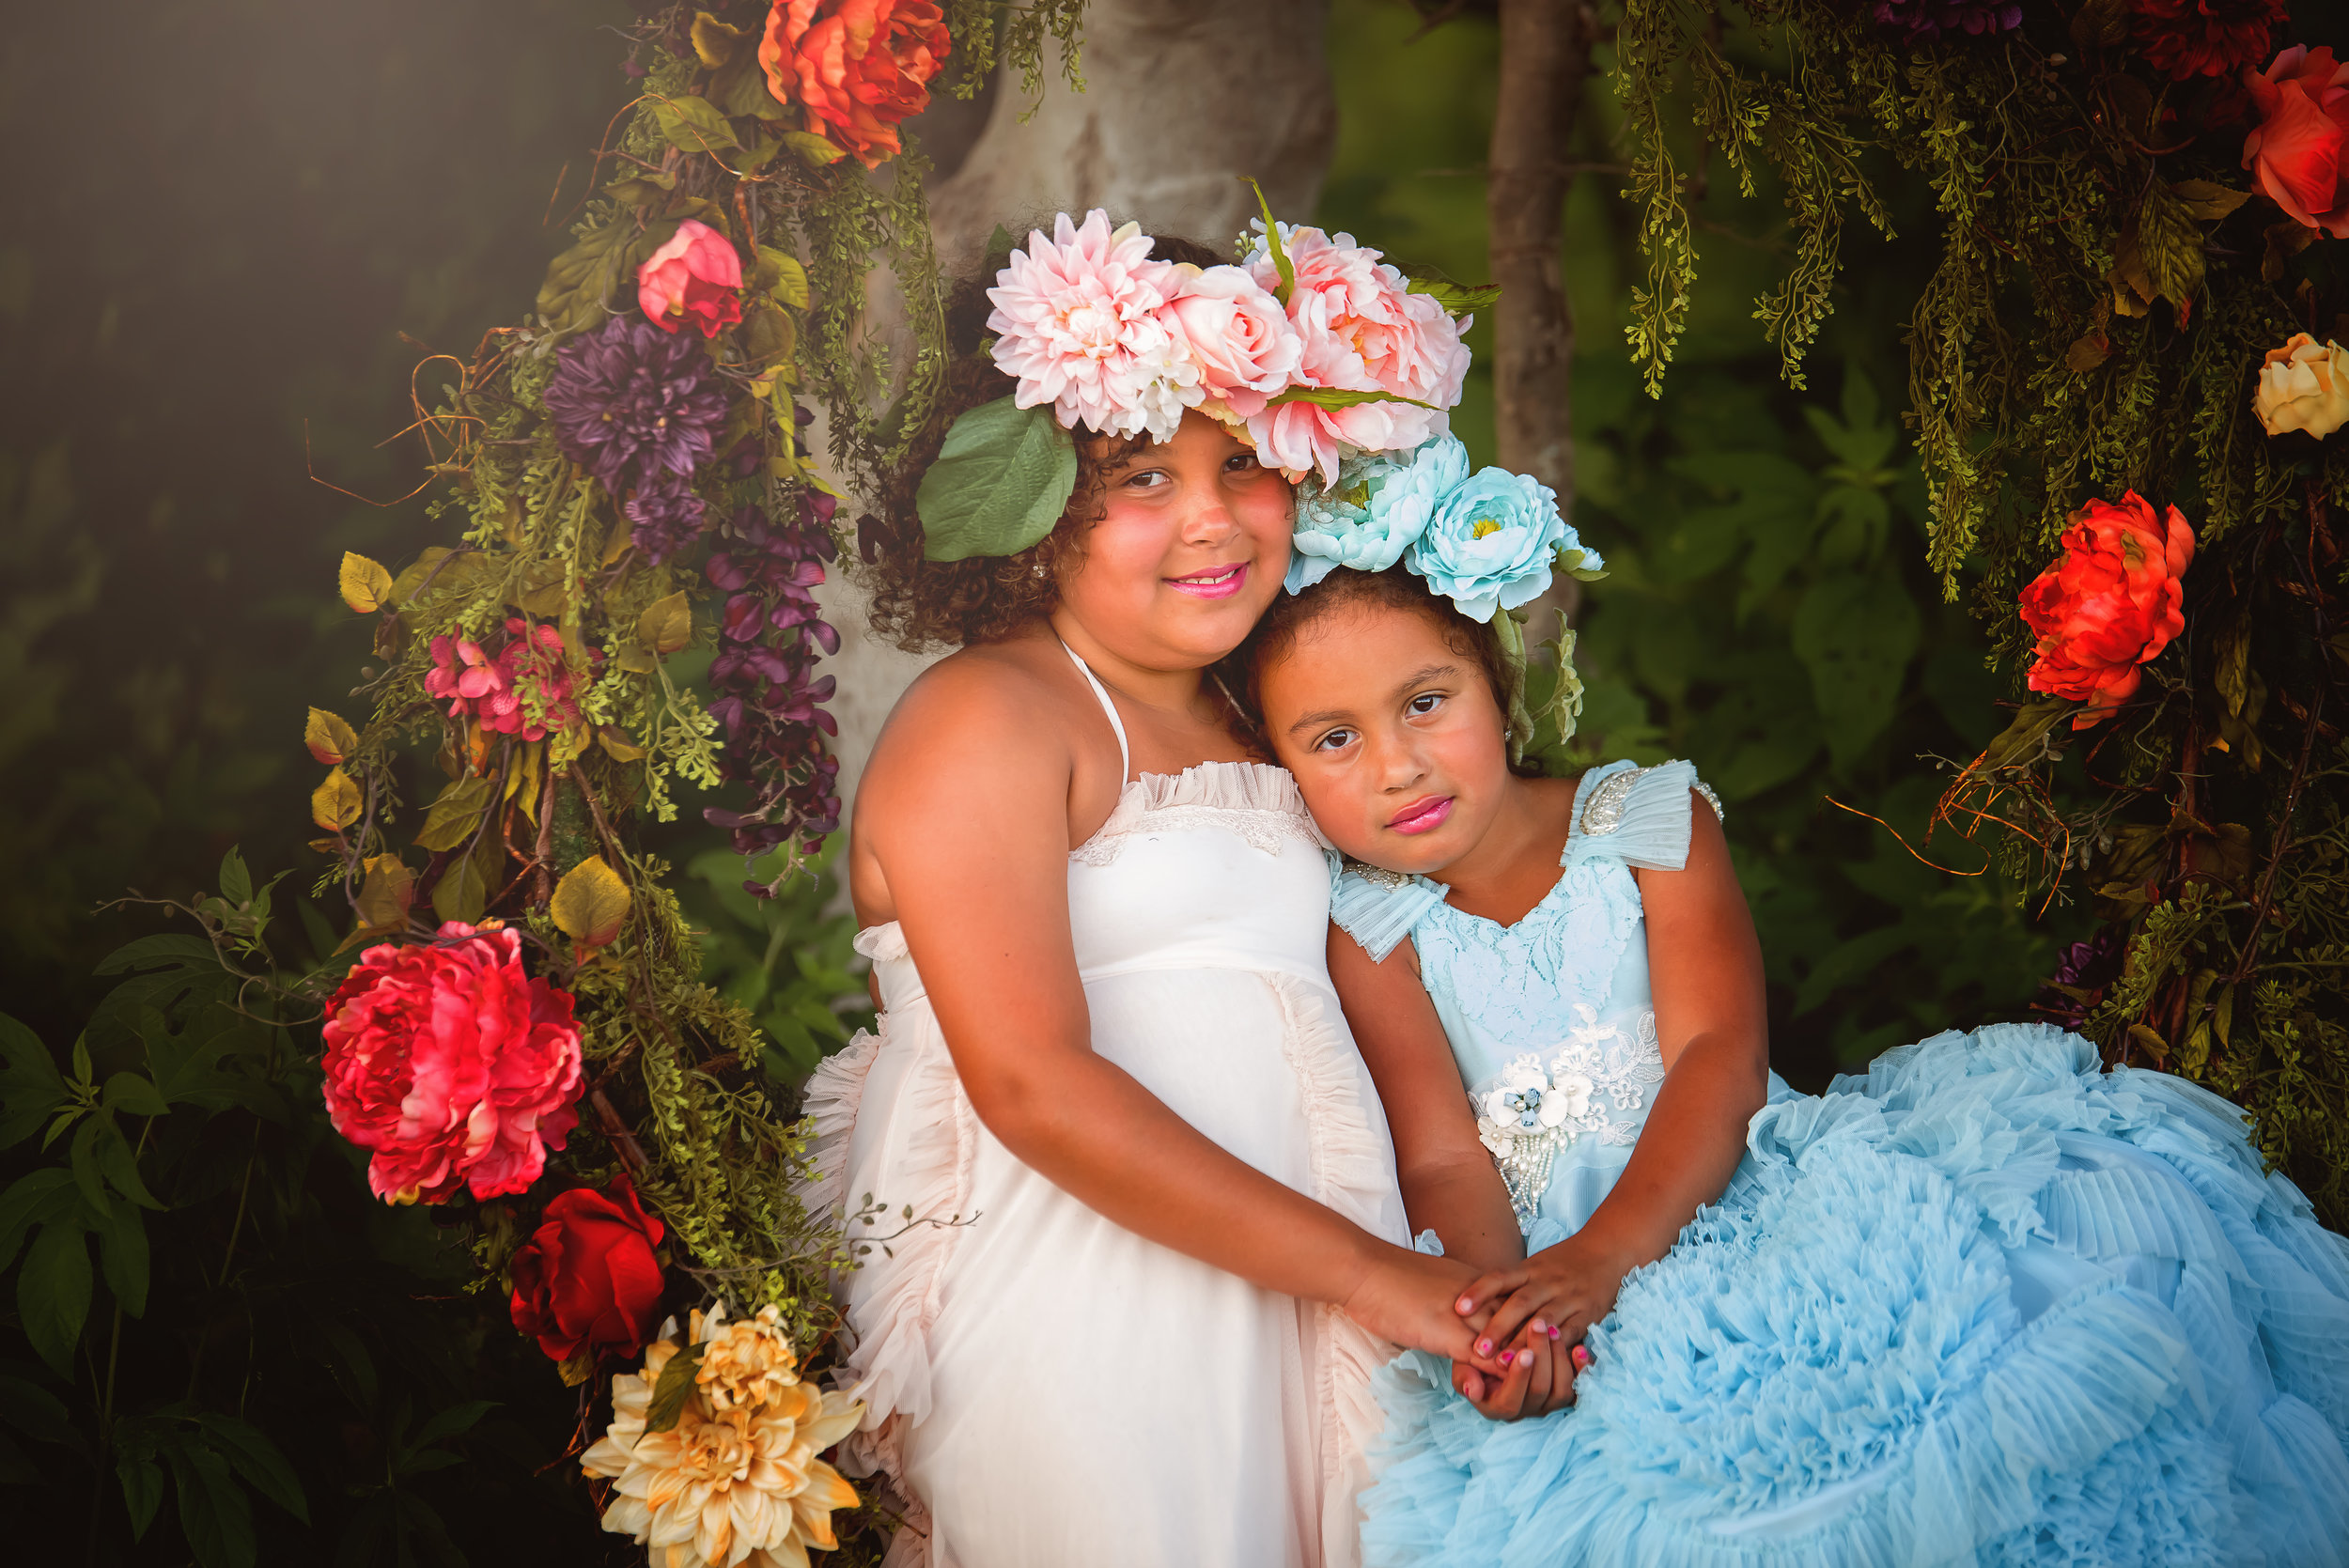 reina-legrand-photography-photographer-child-princess-cinderella-children-haslet-colleyville-fort-worth-dallas-dfw-westlake-southlake-grapevine-keller.jpg